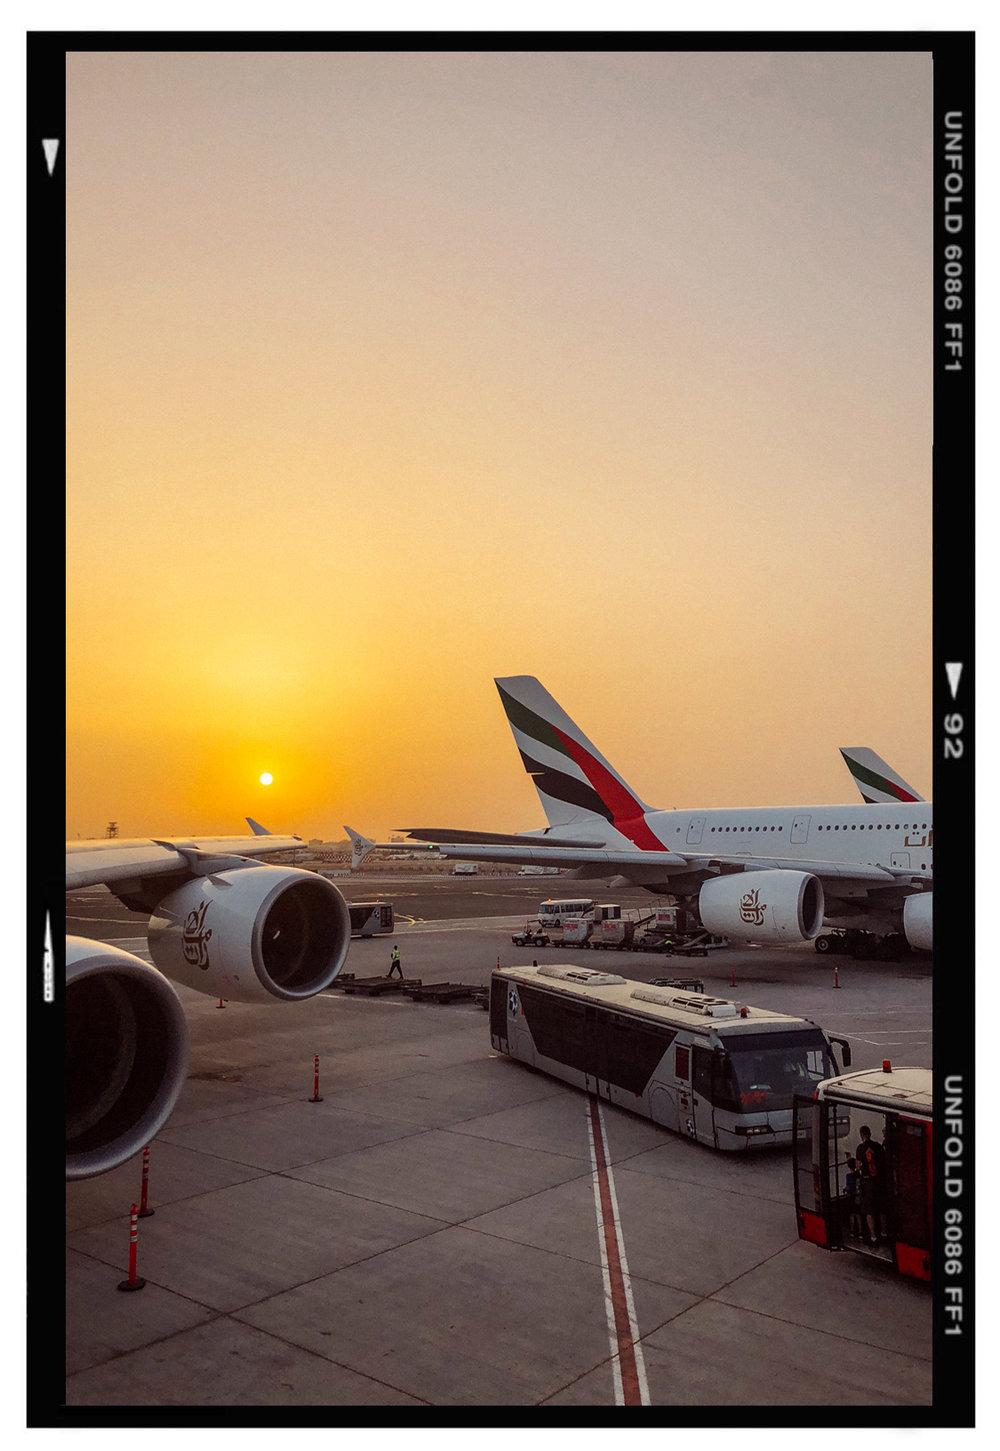 Stylesnooperdan emirates how to get through long haul flight a380.jpg